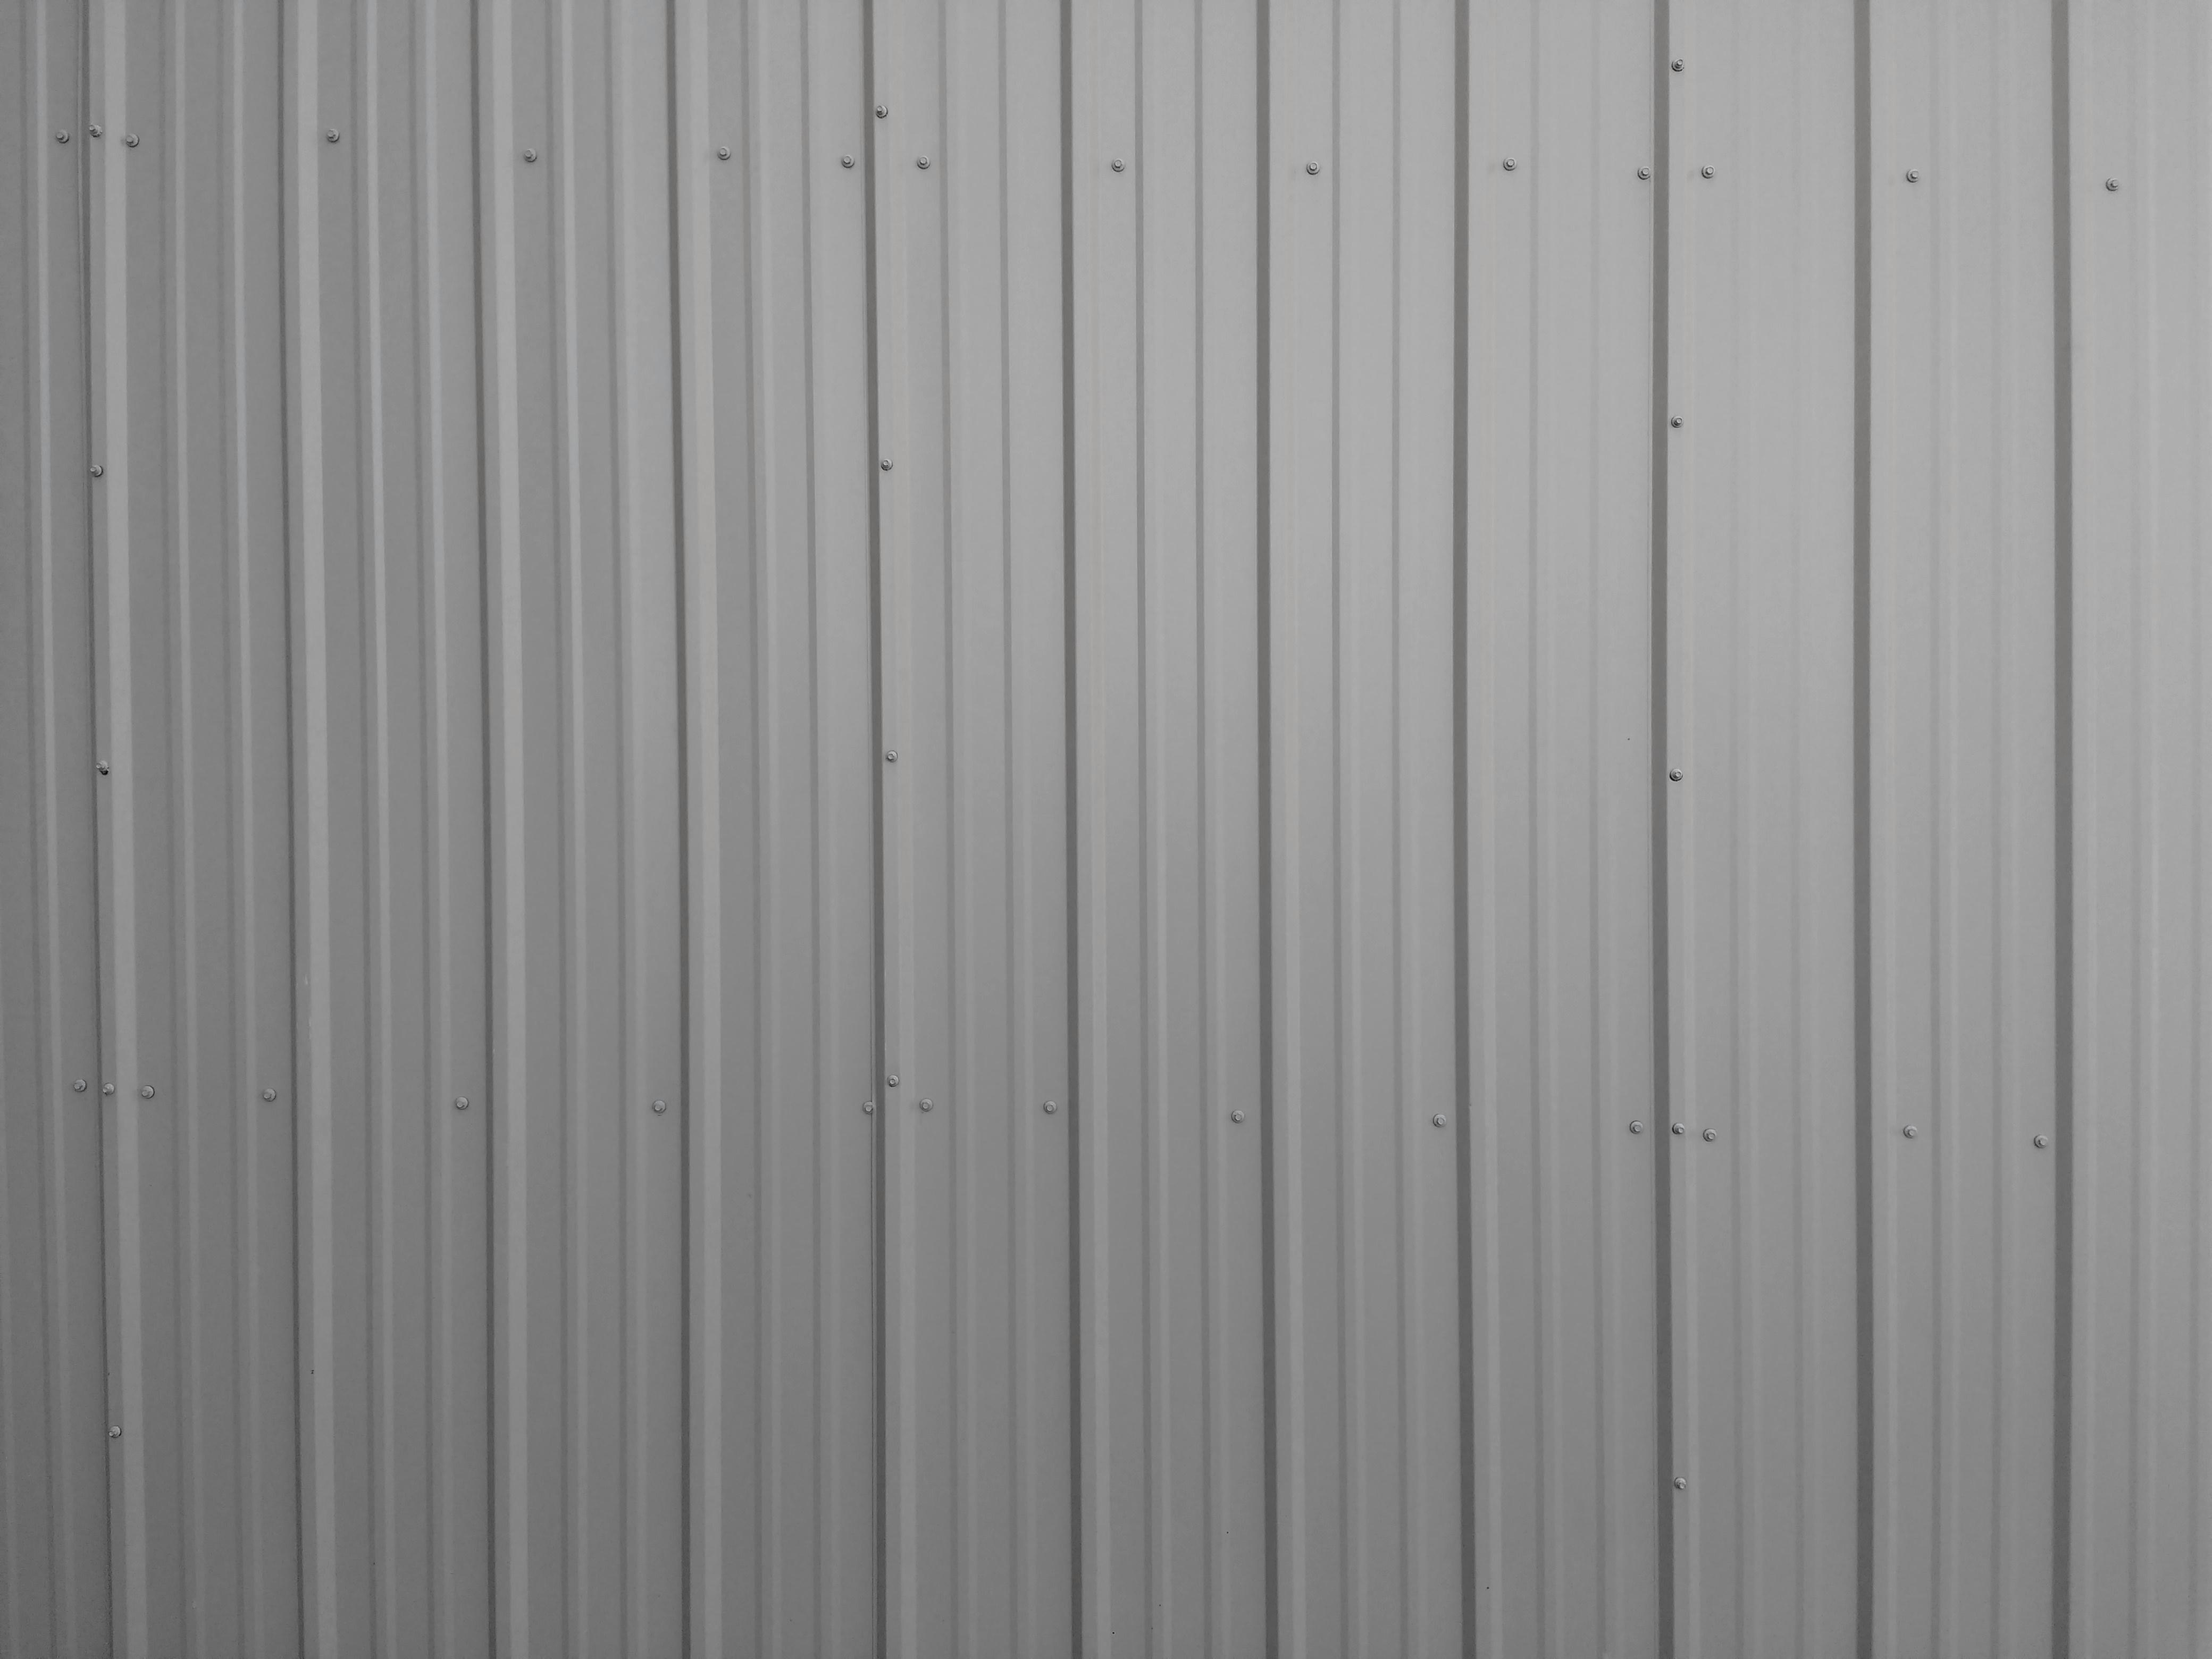 Dark Textures clipart gray metal Texture Domain Photos Siding Pictures